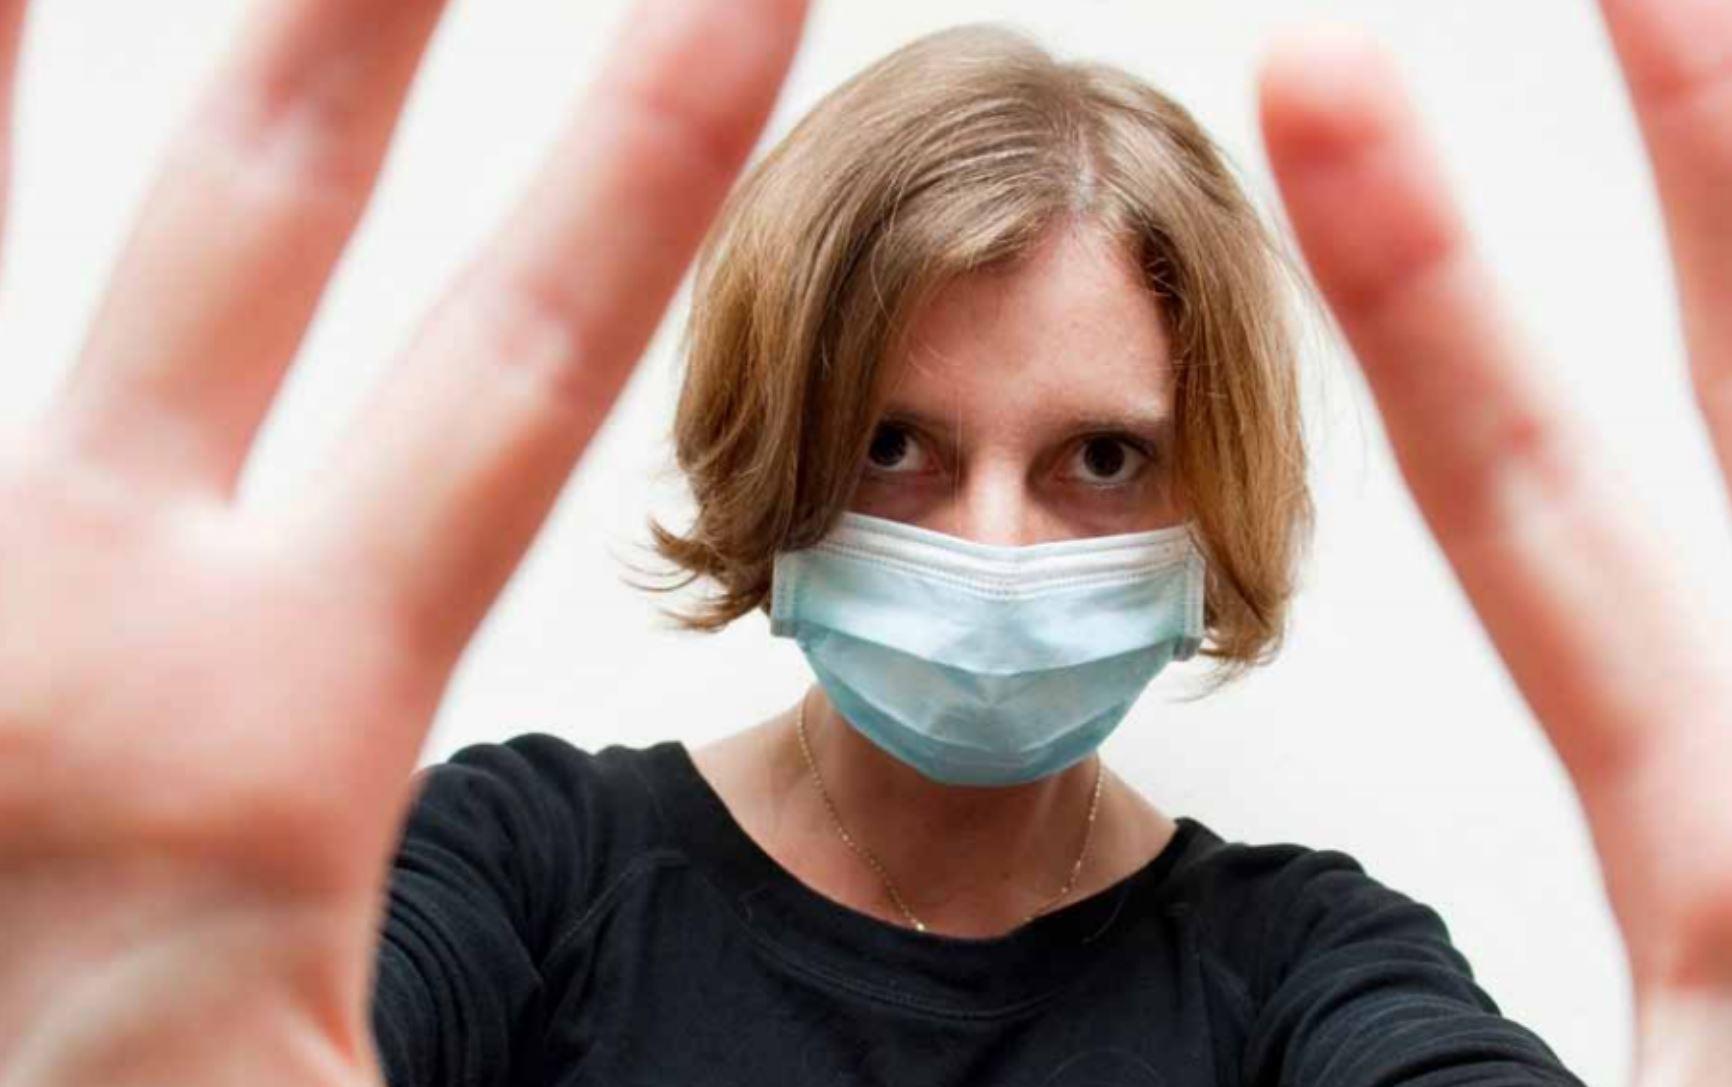 The Pandemic of Panic 2